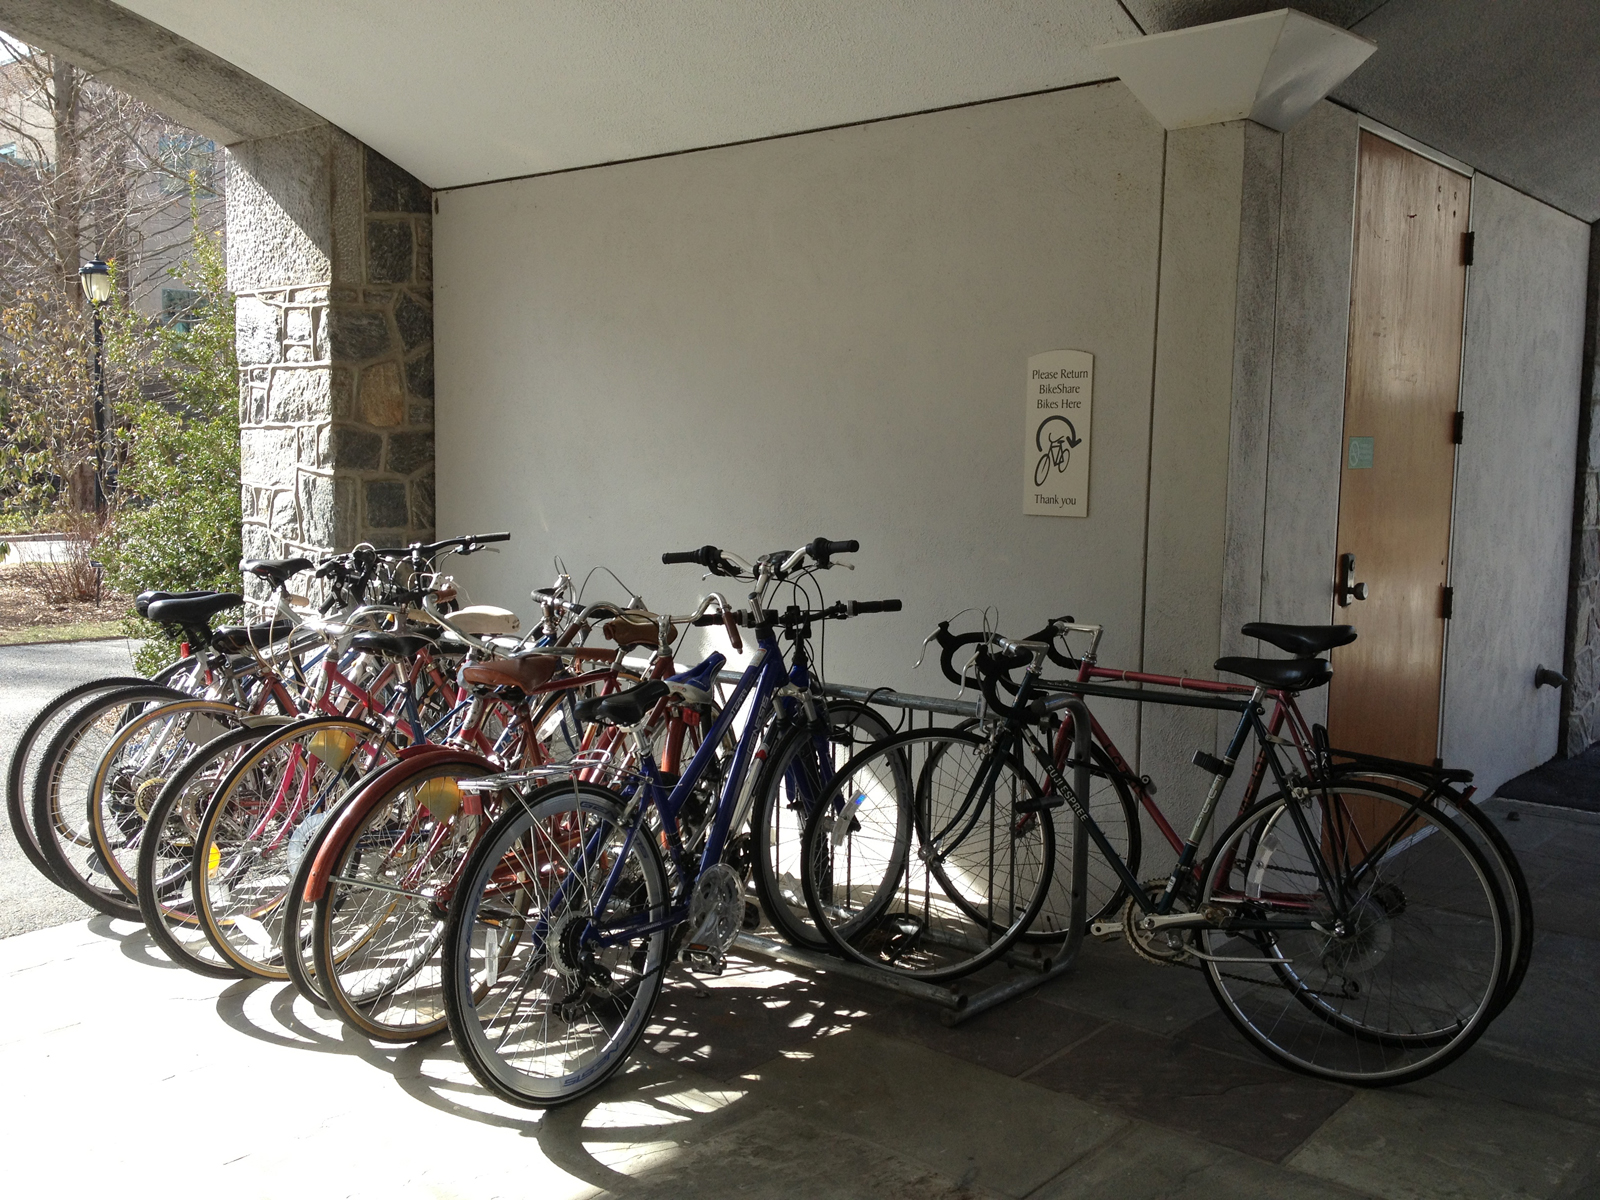 yenny - bikeshare1_web image